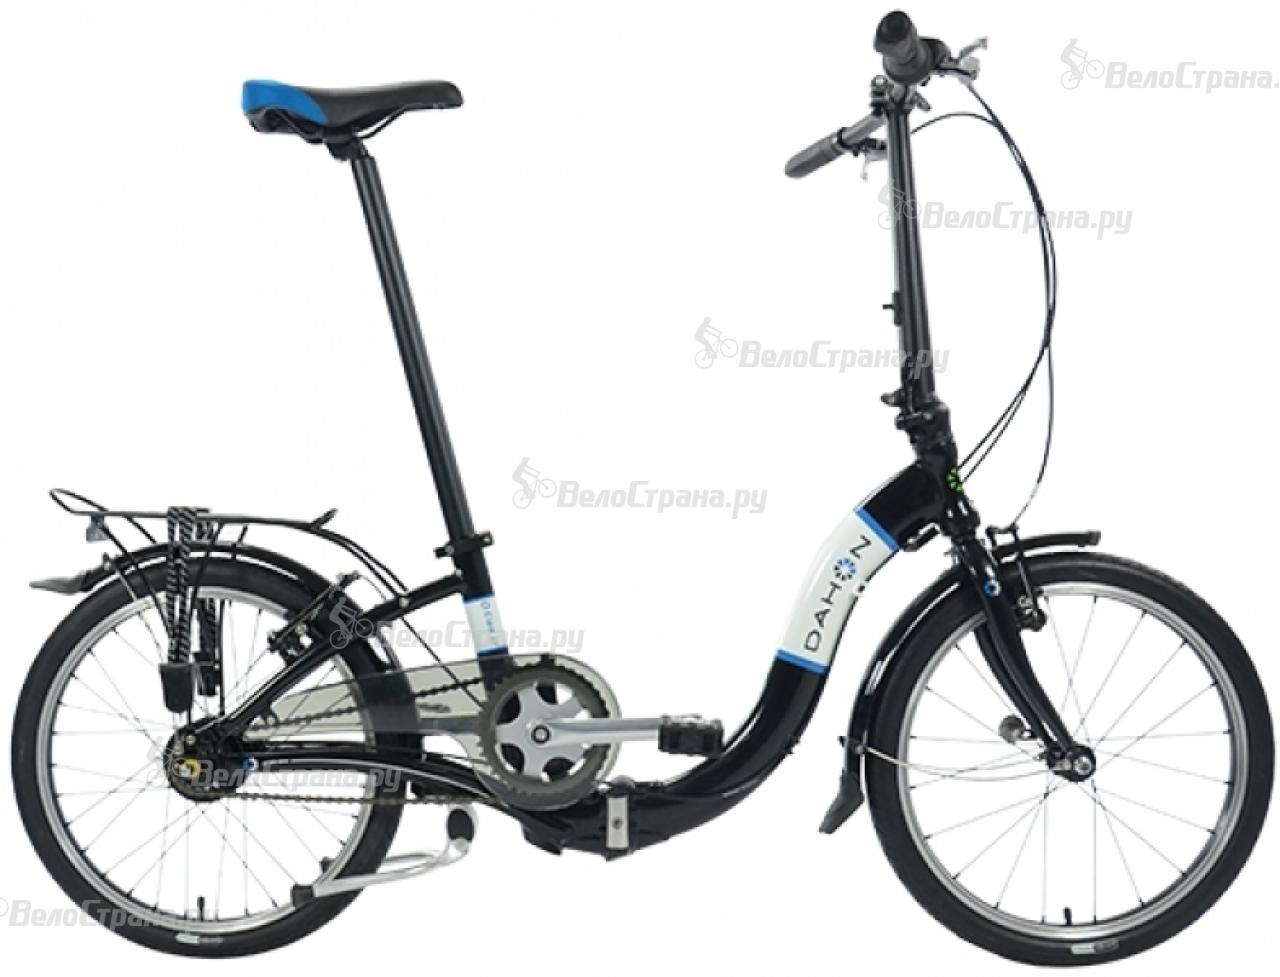 Велосипед Dahon Ciao i7 (2017) велосипед dahon ciao d7 2014